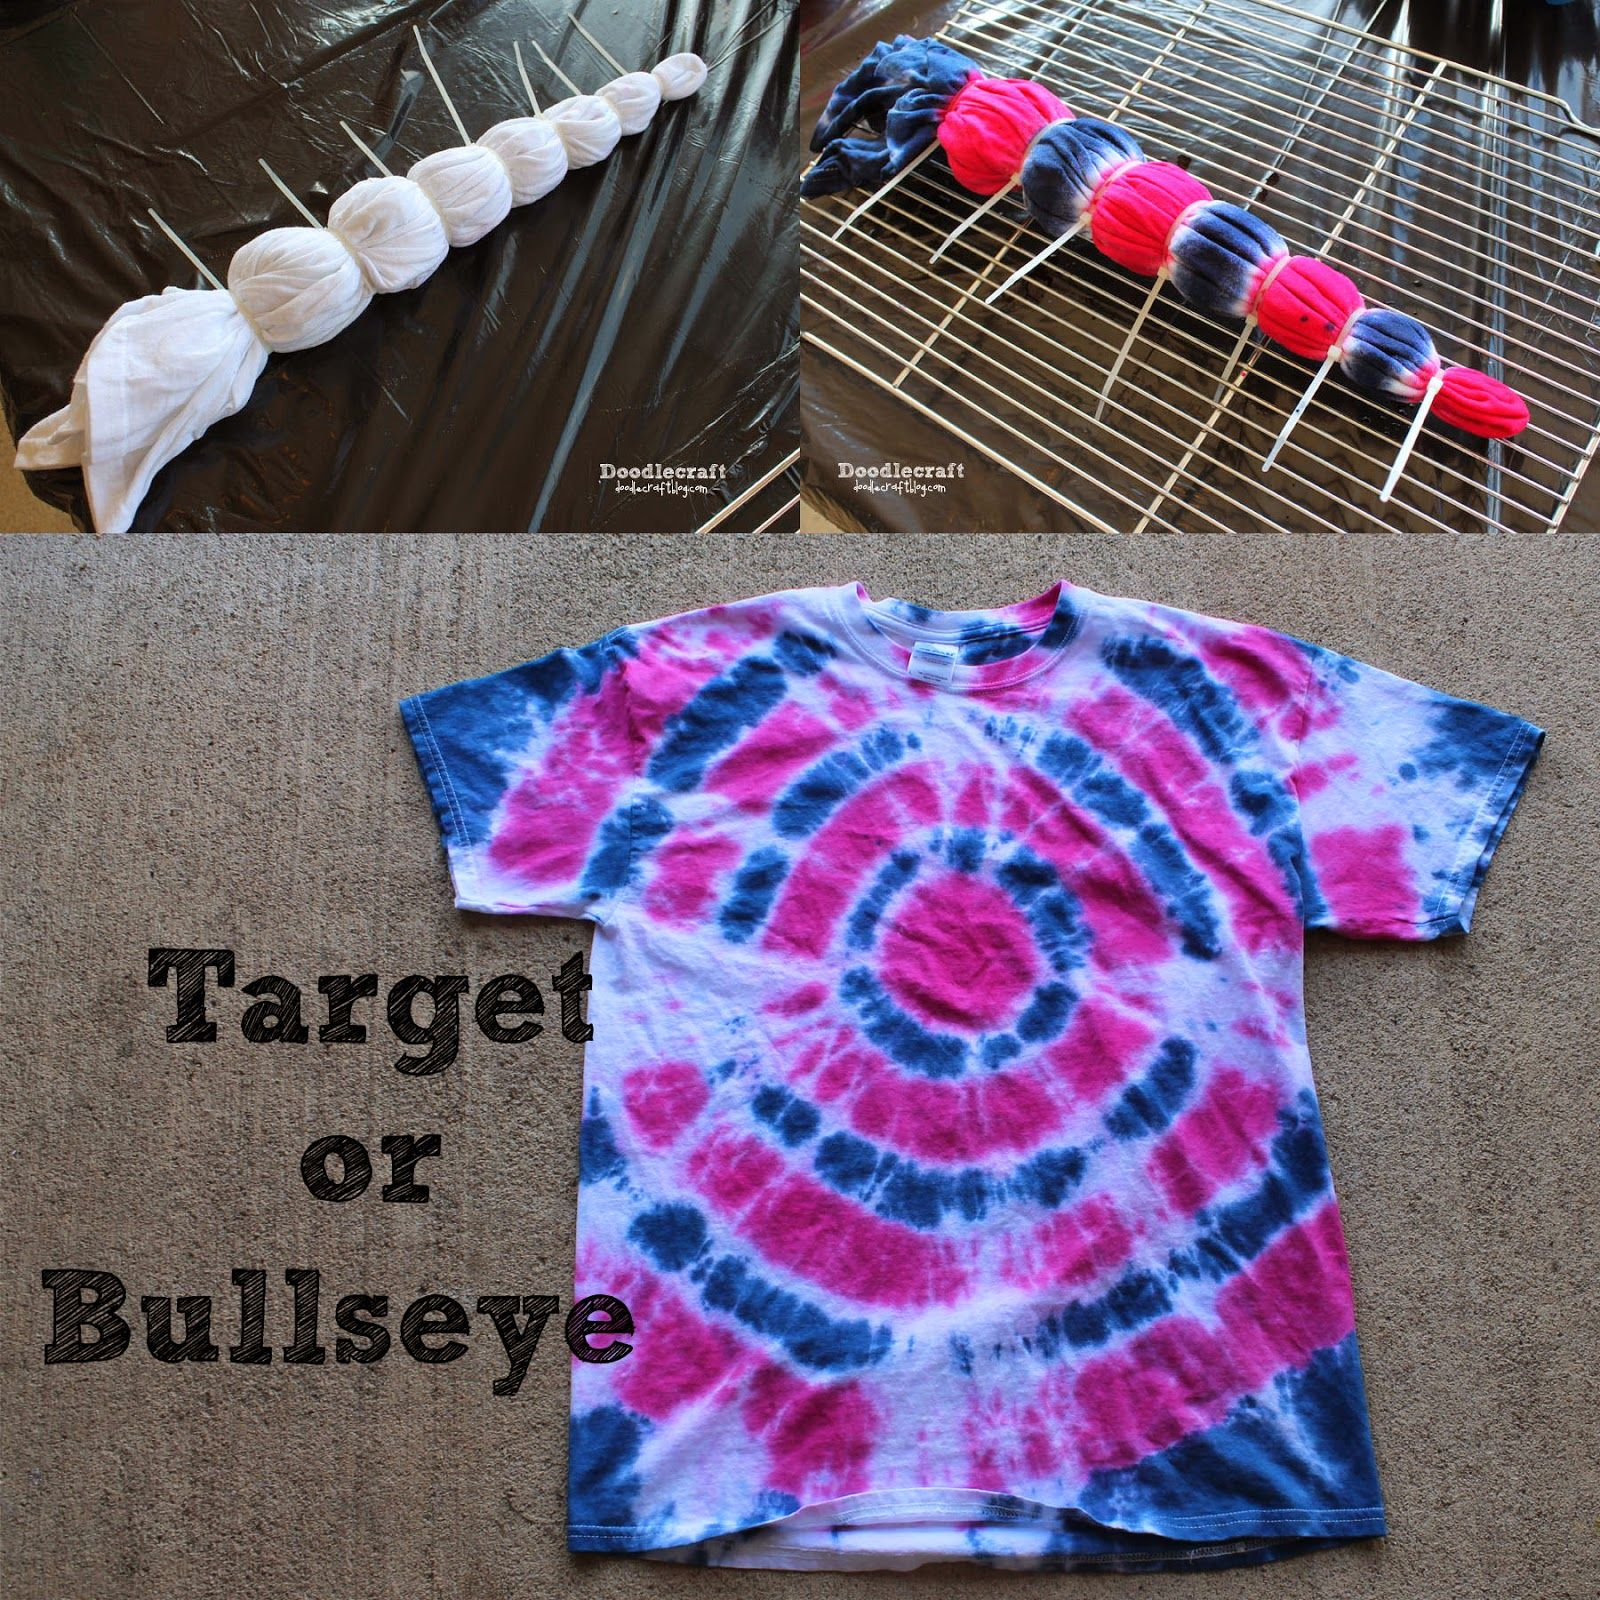 Tulip Tie Dye T Shirt Party Target Or Bulls Eye Pattern